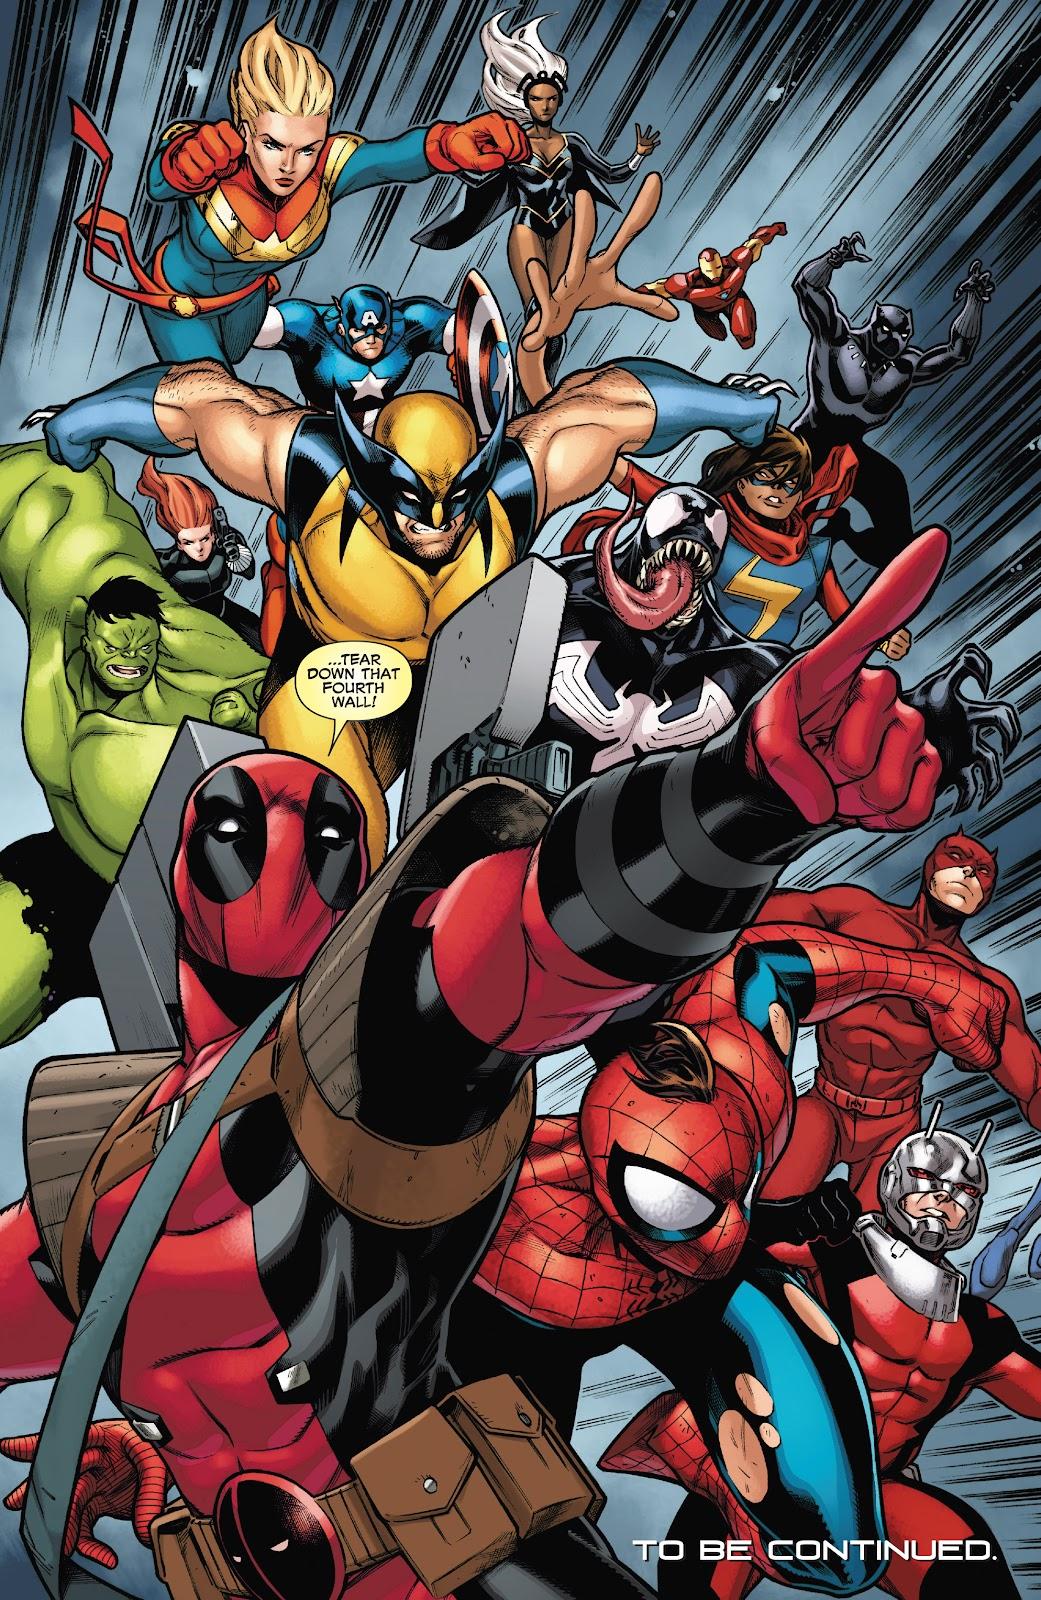 Read online Spider-Man/Deadpool comic -  Issue #48 - 22